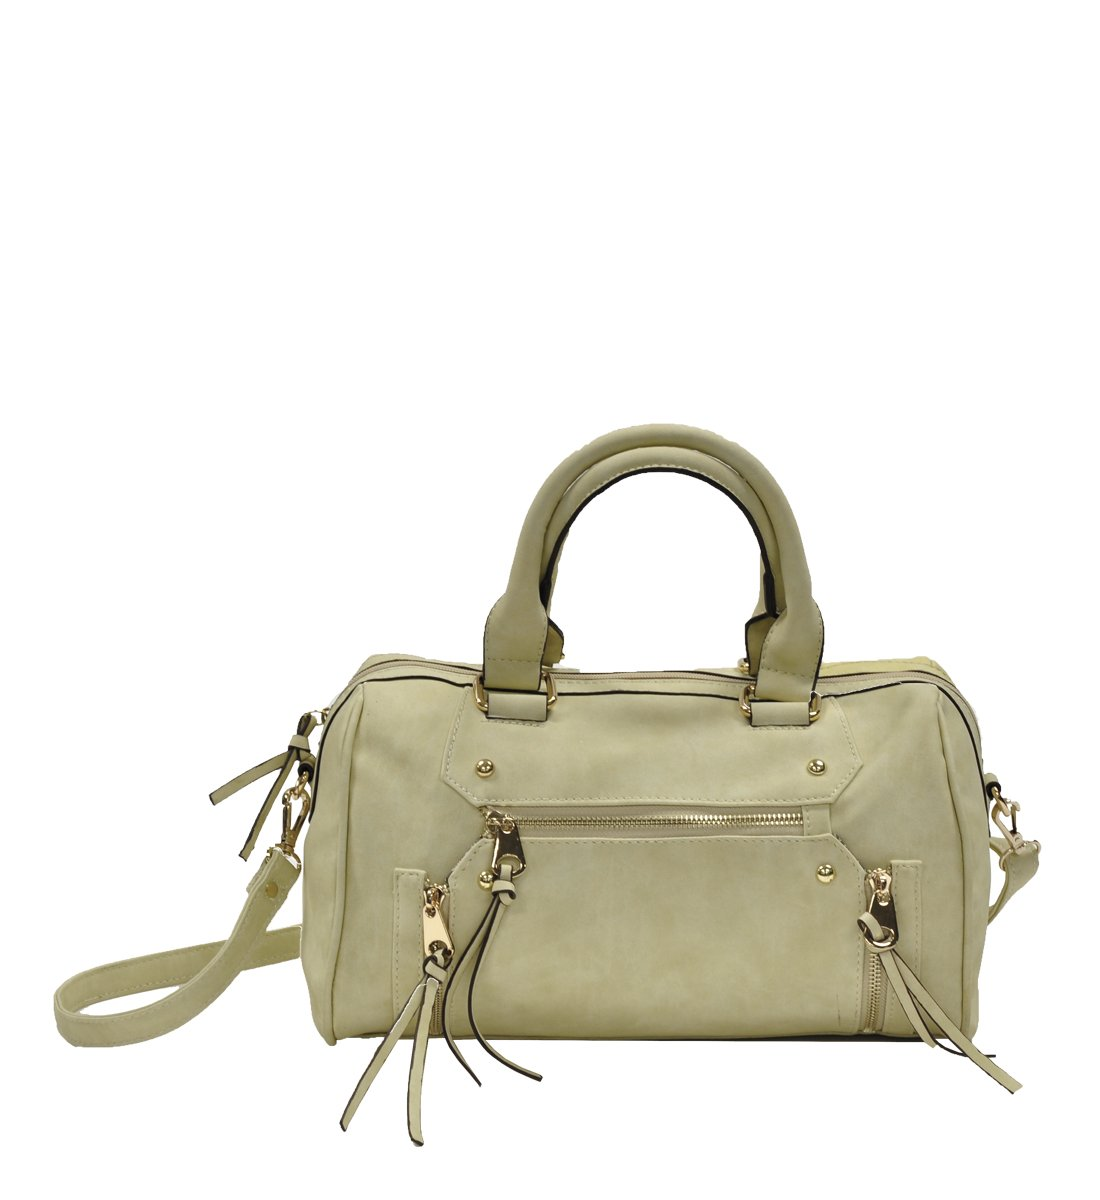 MoDA Athena Goddess Women's Summer Satchel Handbag, Cream